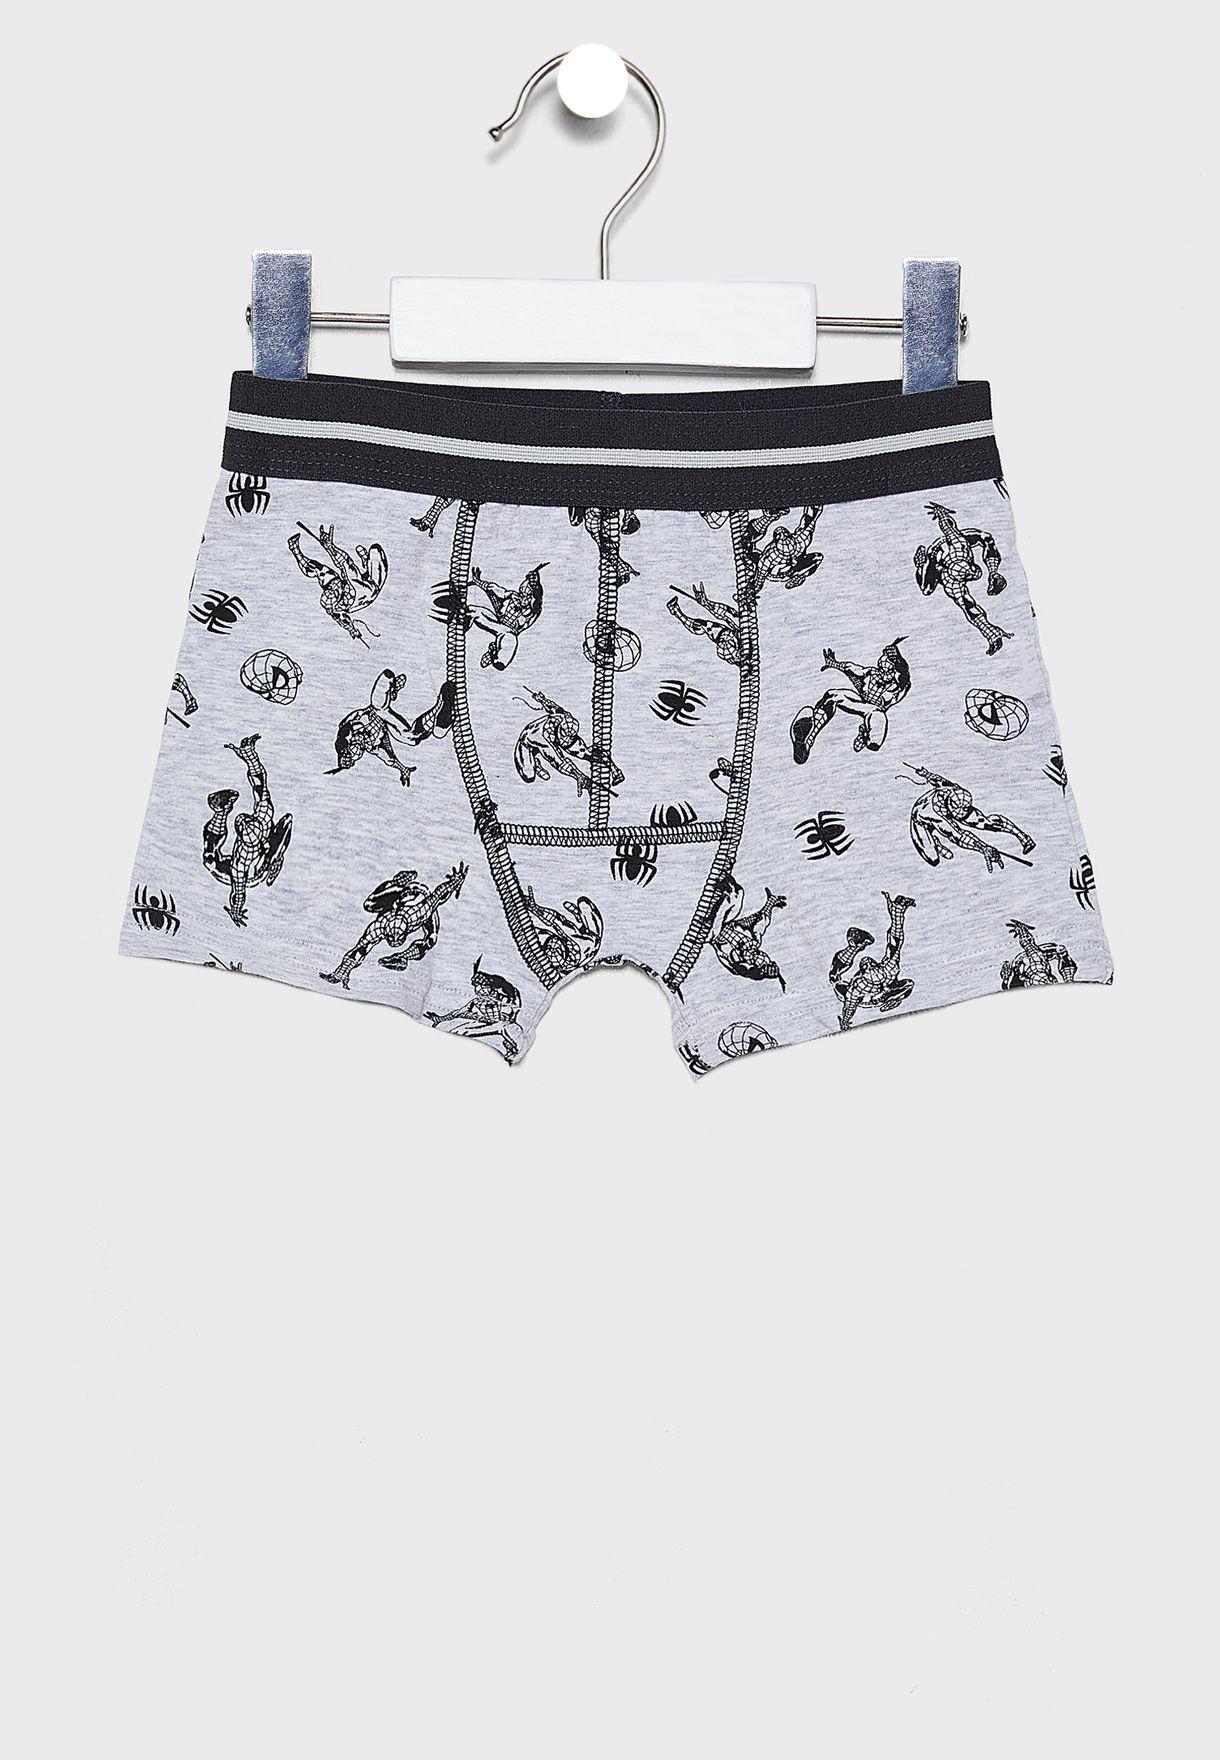 Kids 2 Pack Printed Boxer Shorts